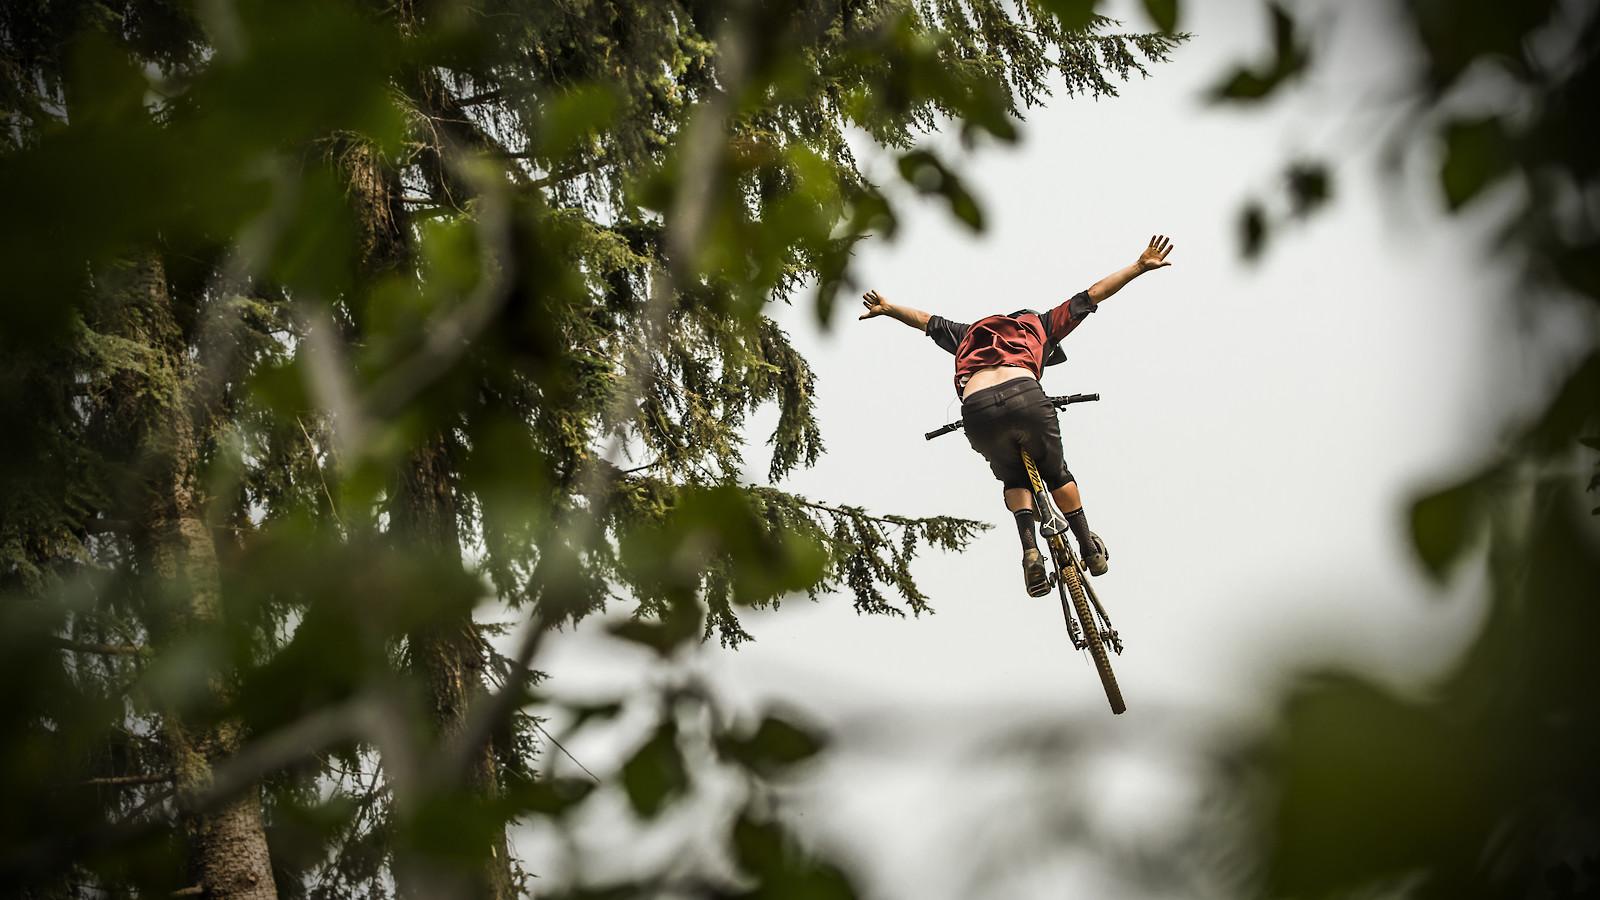 43278065130 1b14827811 o - phunkt.com - Mountain Biking Pictures - Vital MTB